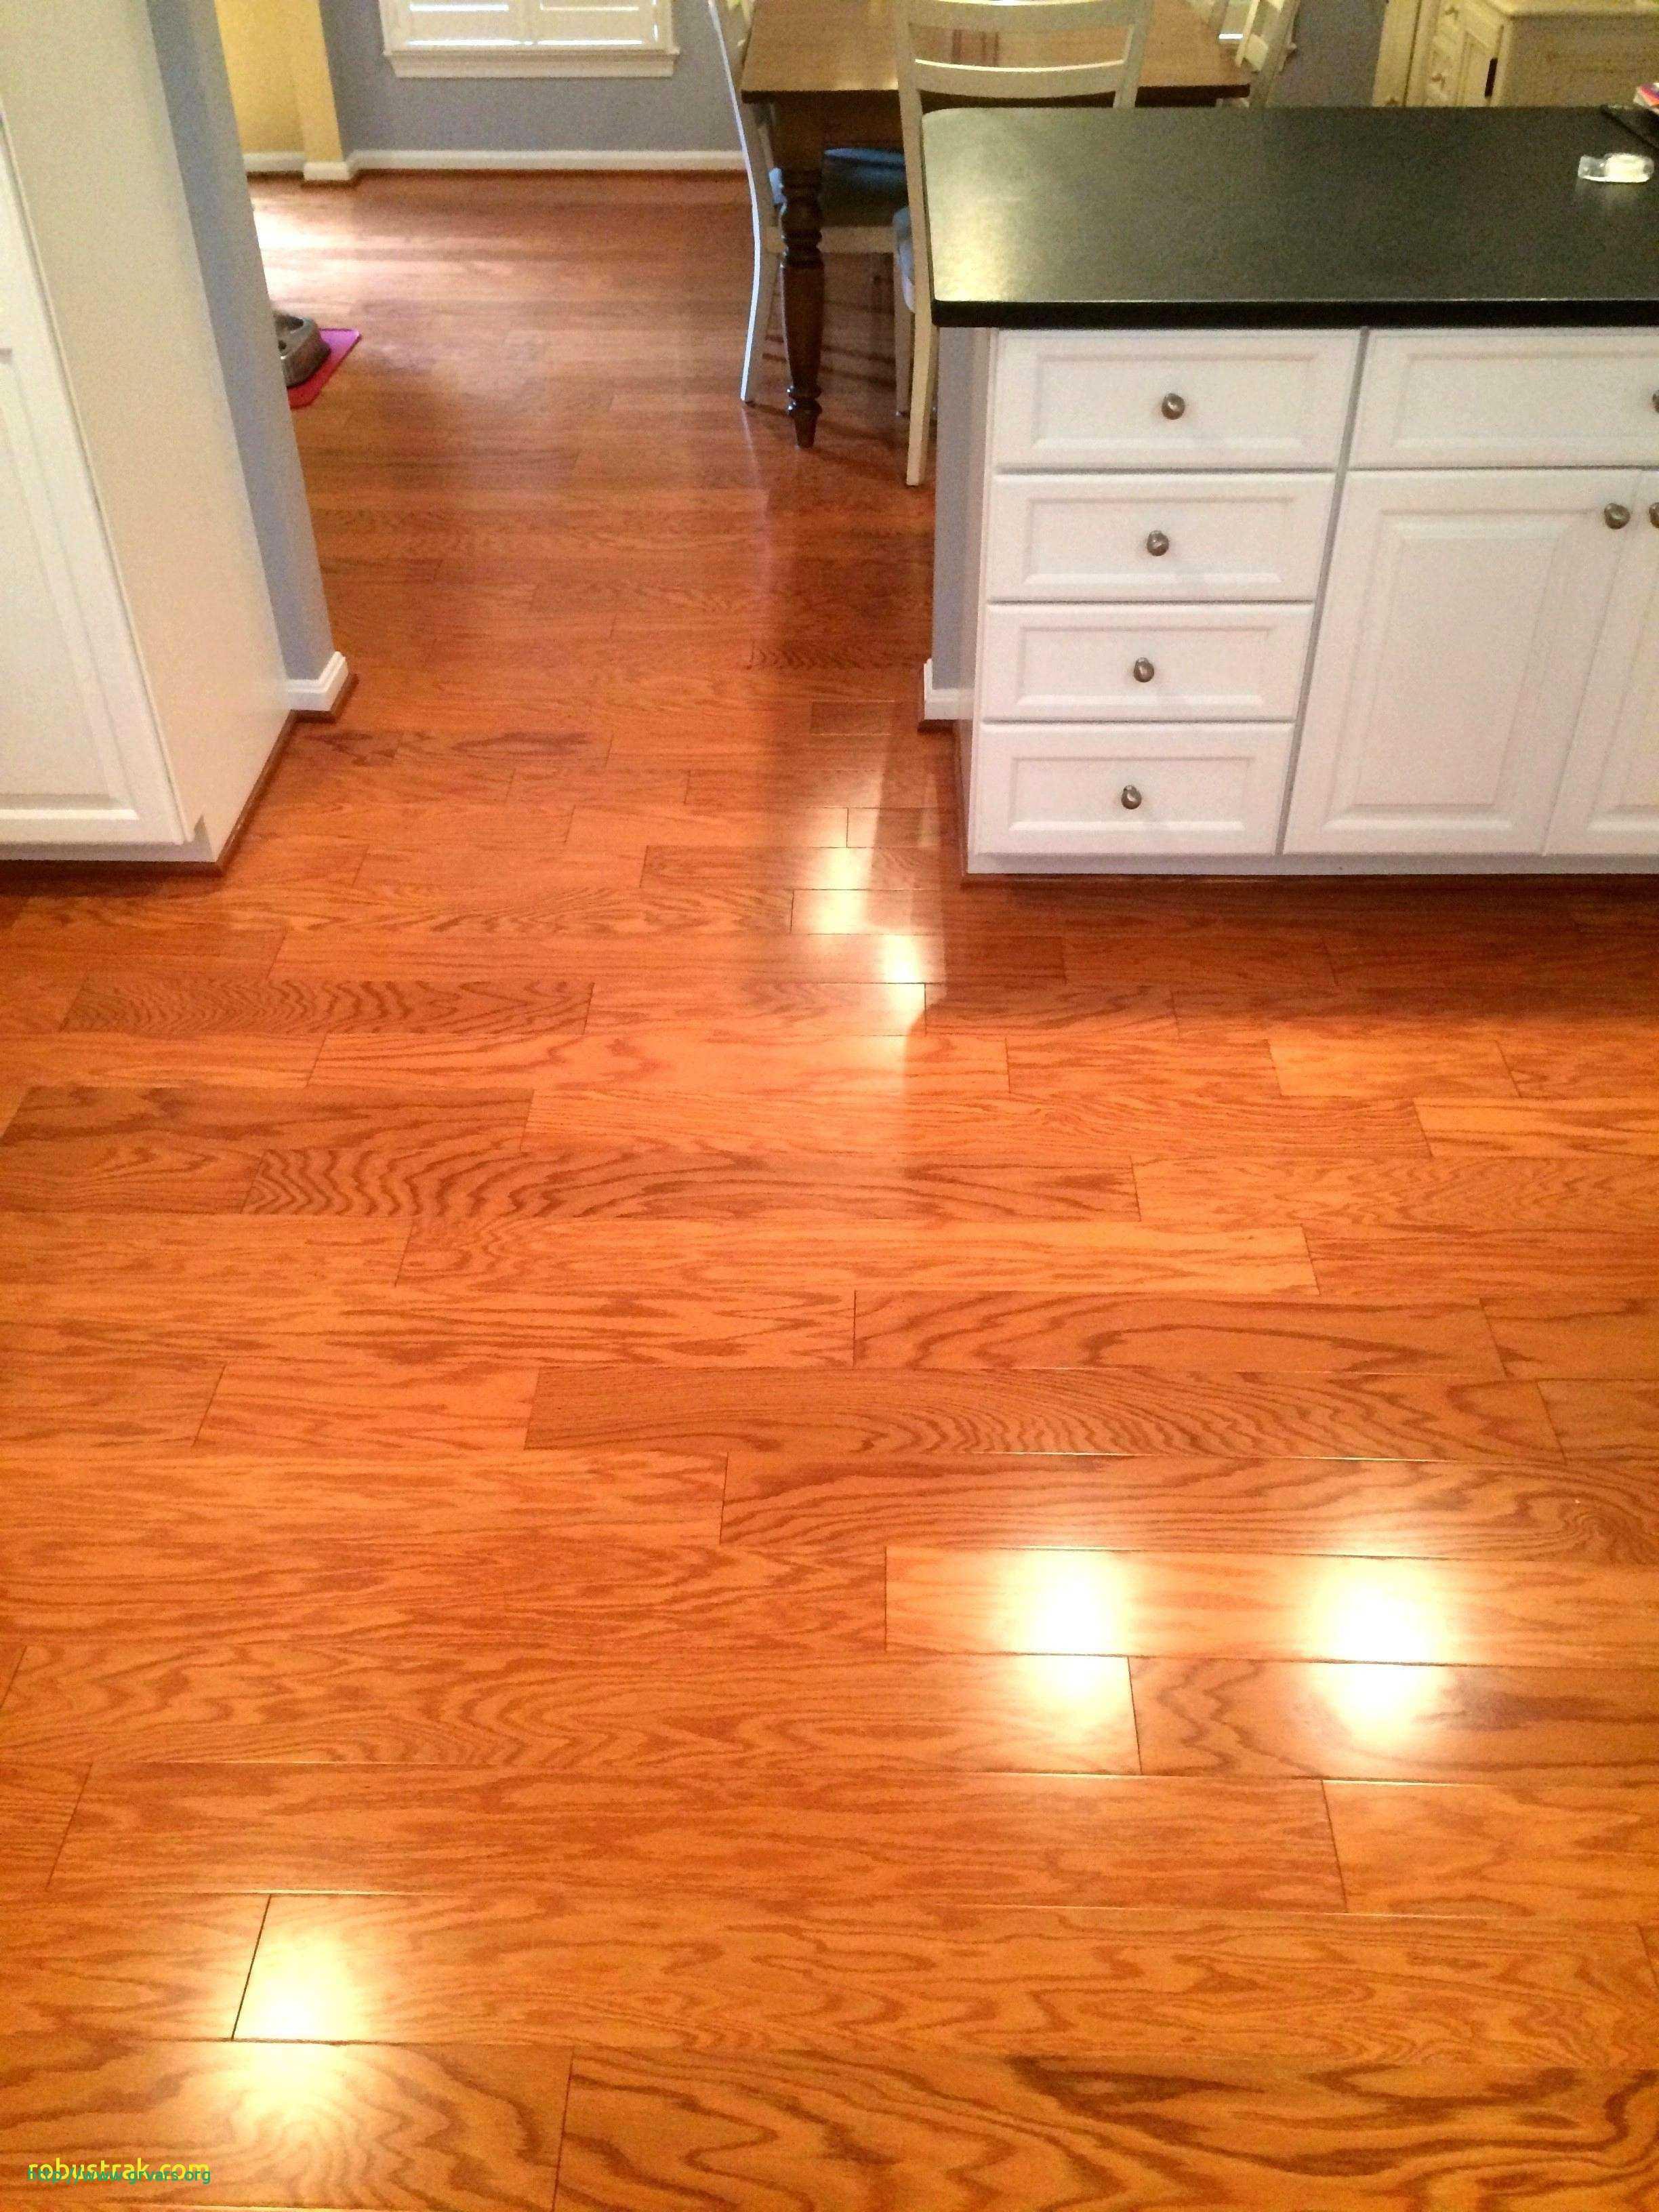 acacia hardwood flooring prices of 15 beau best place for hardwood flooring ideas blog pertaining to best place for hardwood flooring luxe 40 best place to buy wood flooring ideas